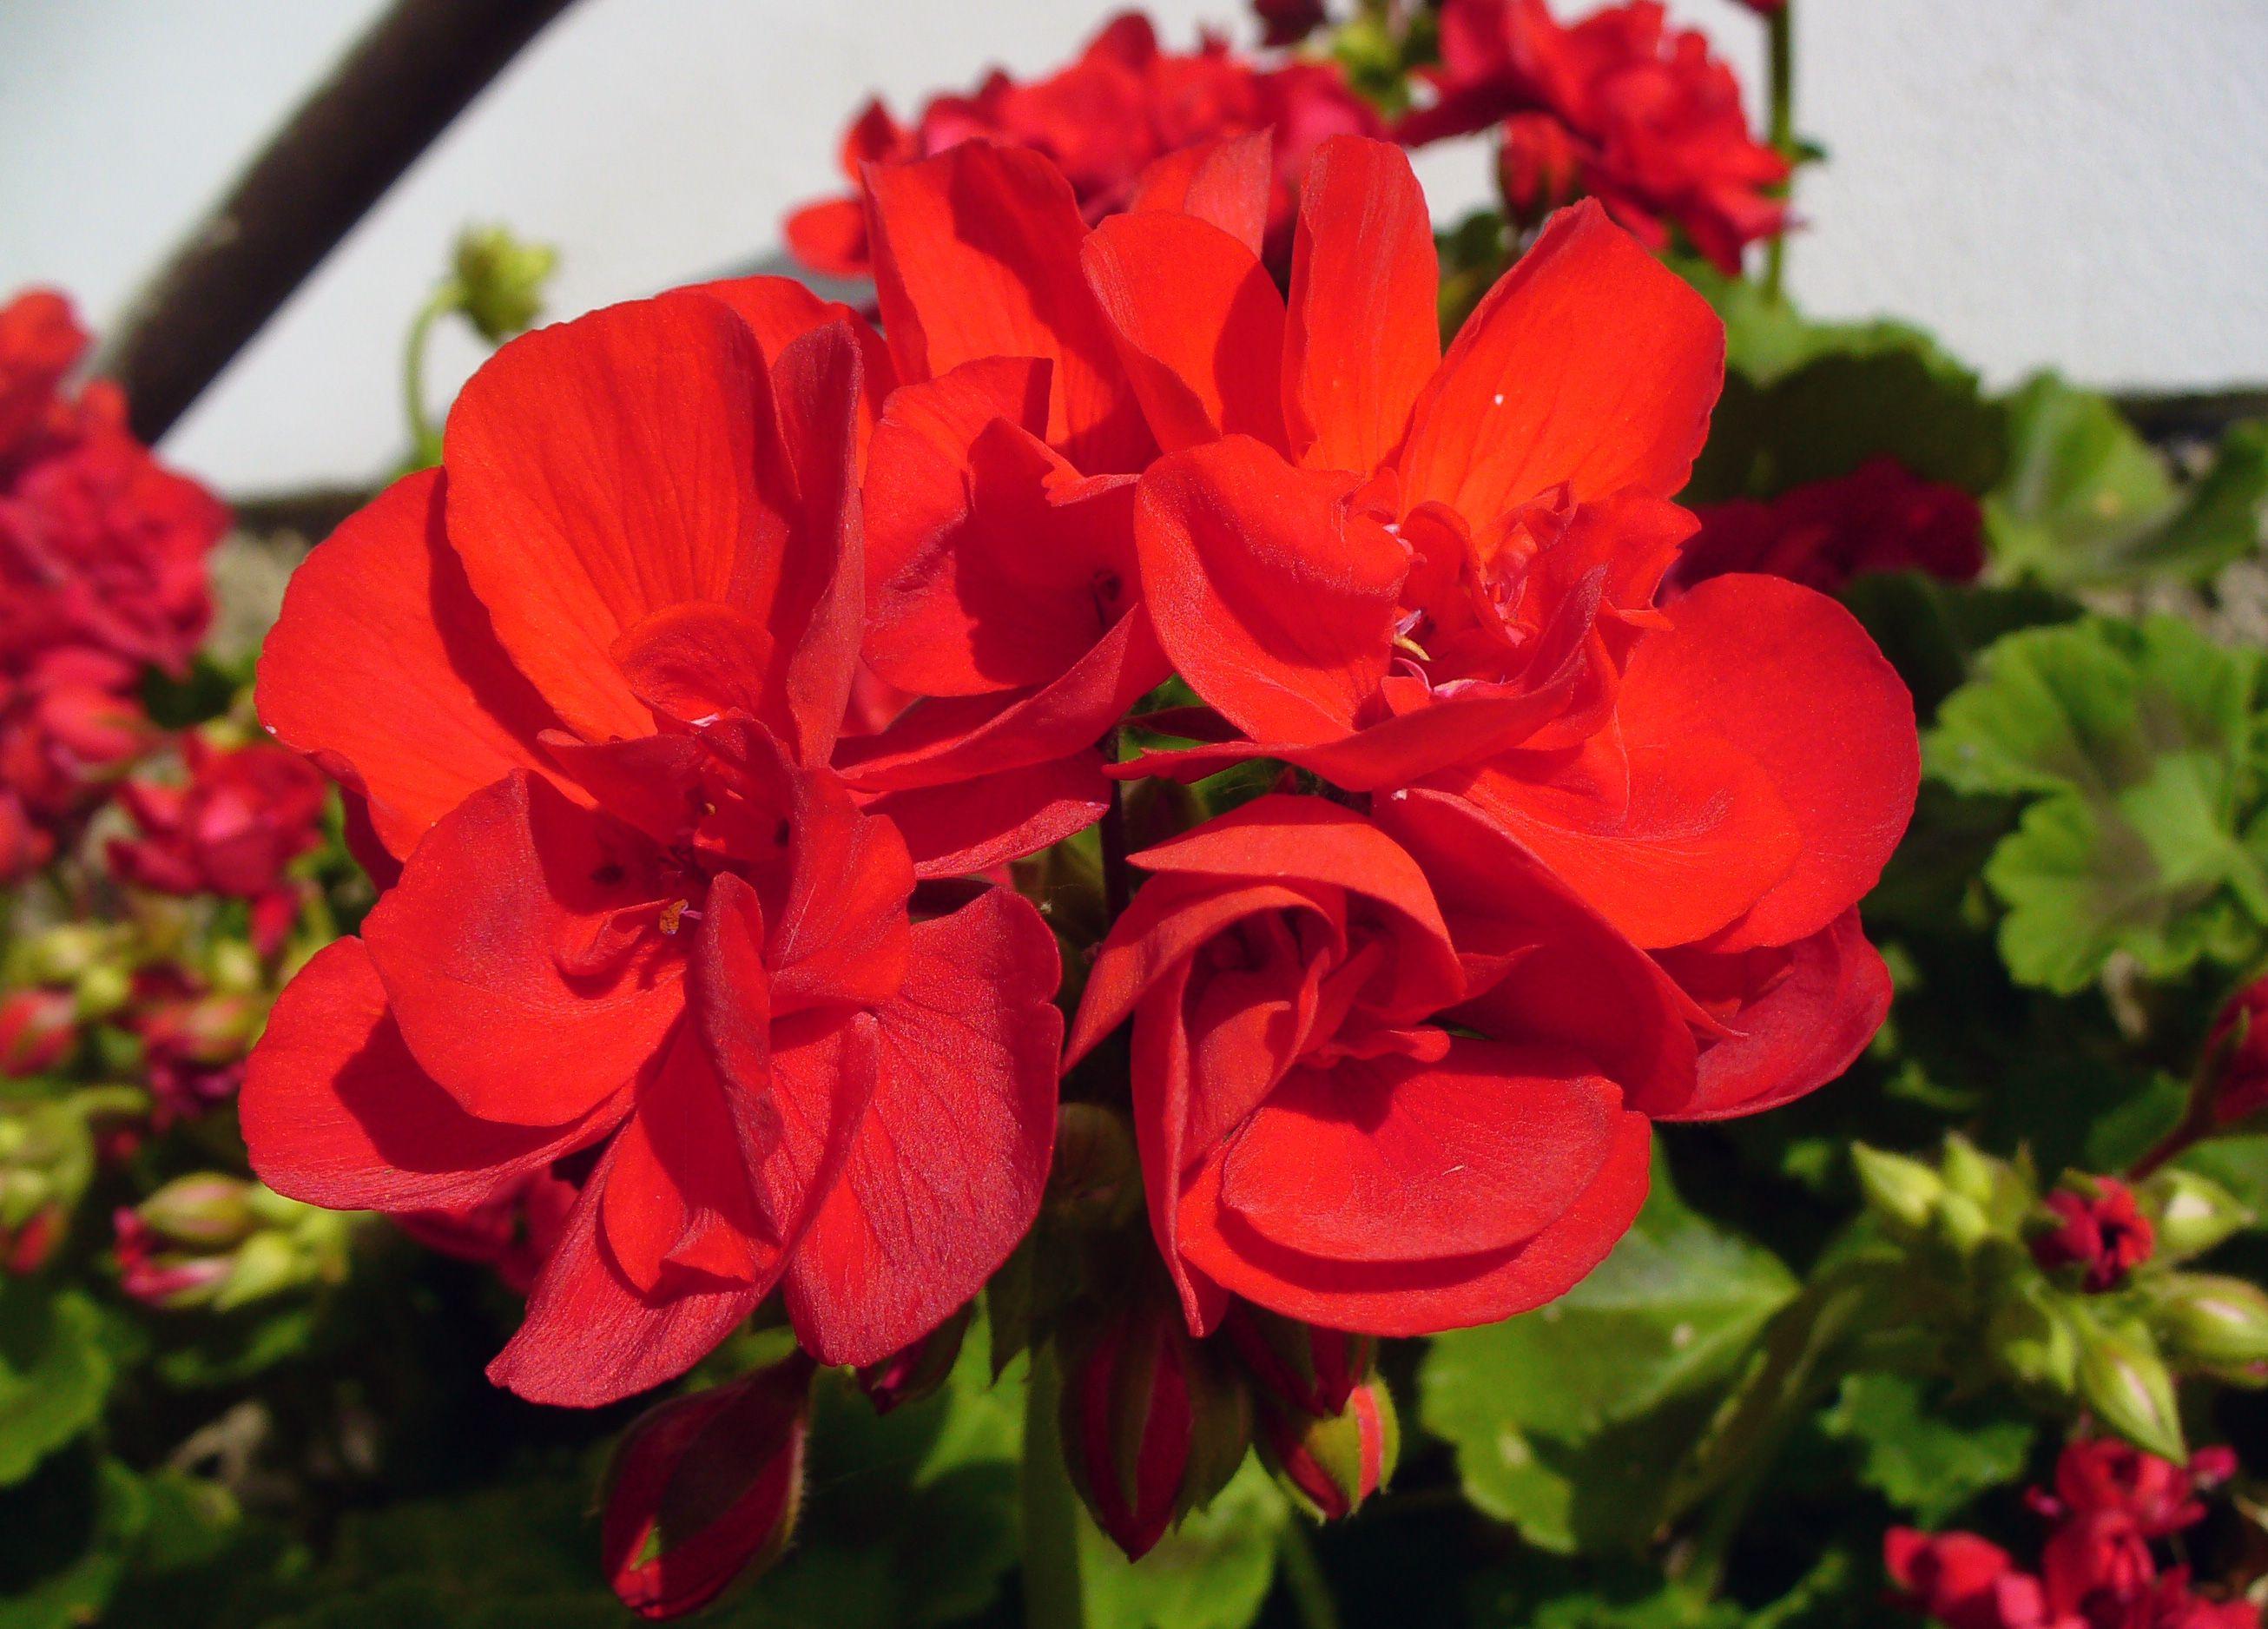 free image: red flower | libreshot public domain photos